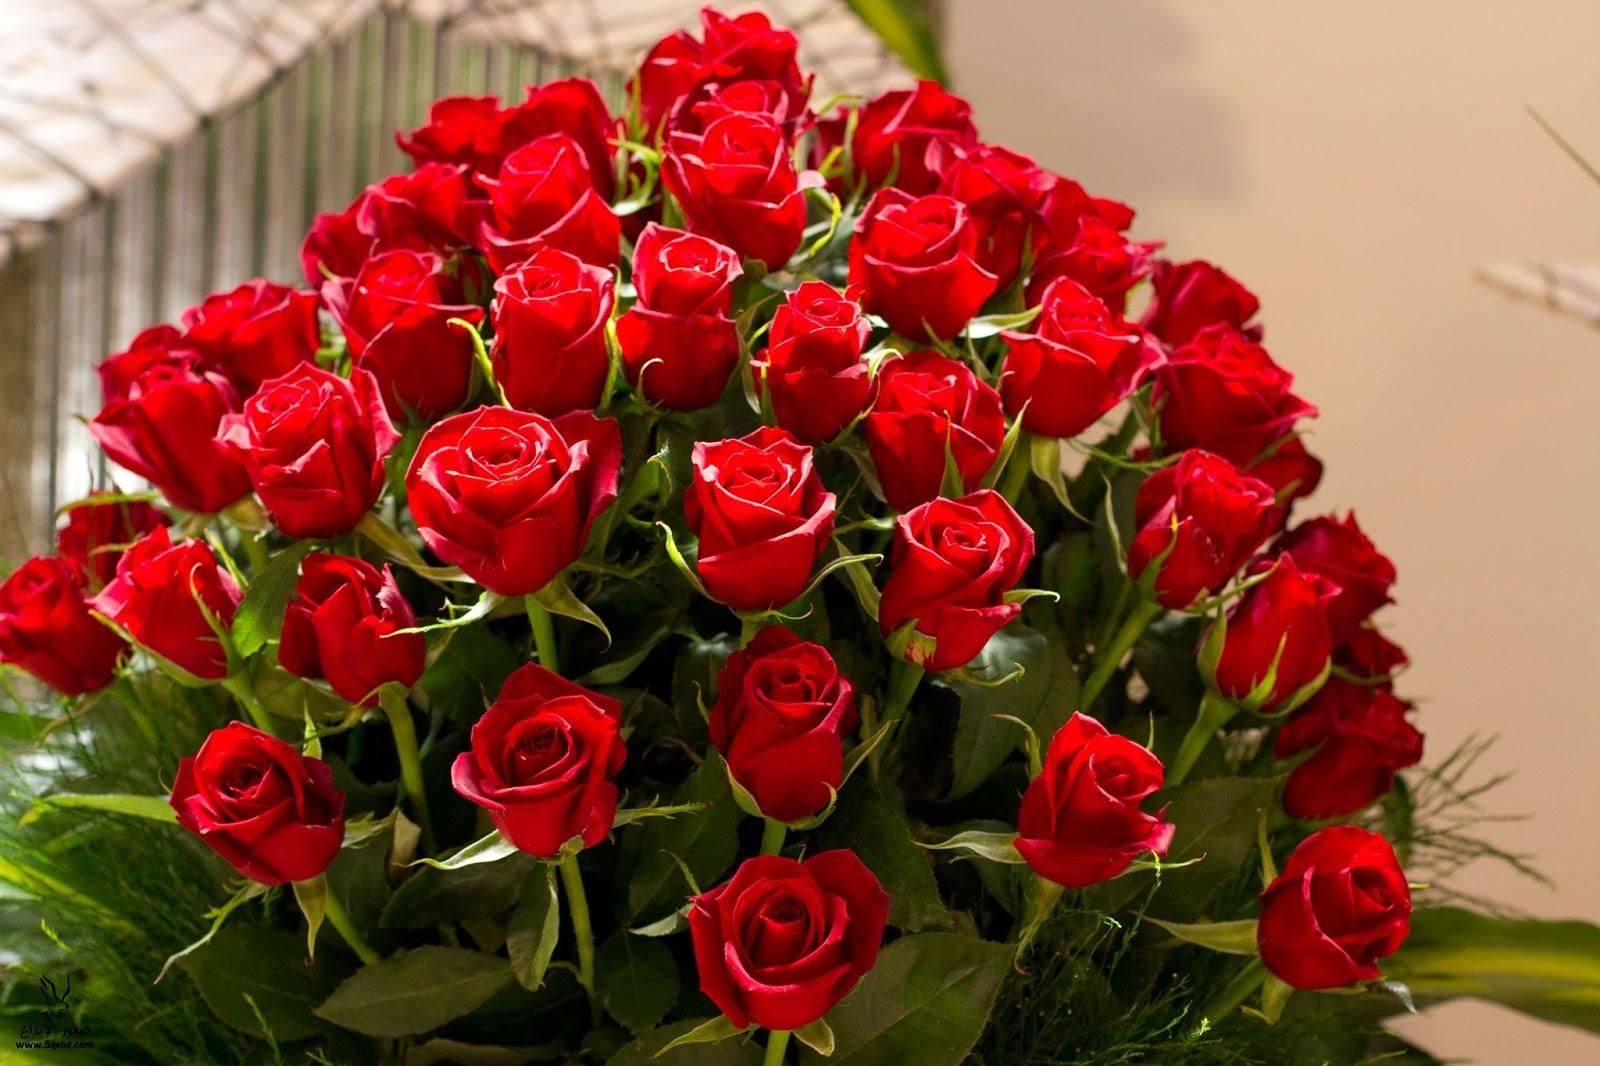 بالصور اجمل صور الورد , صور ورد روعة 2517 11